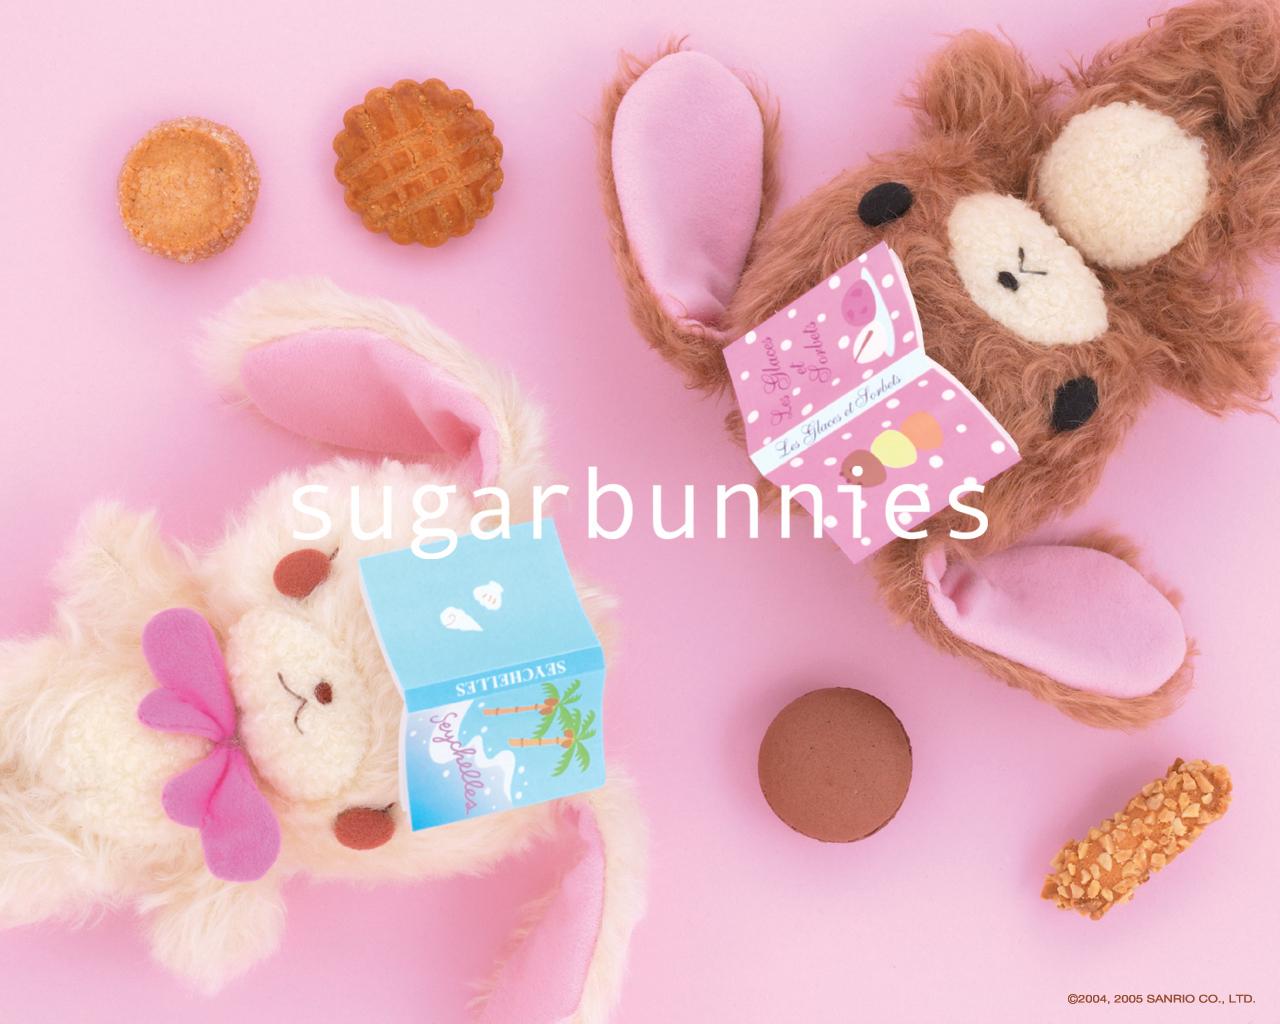 Sugarbunnies Wallpaper   Sugarbunnies Wallpaper 8399083 1280x1024